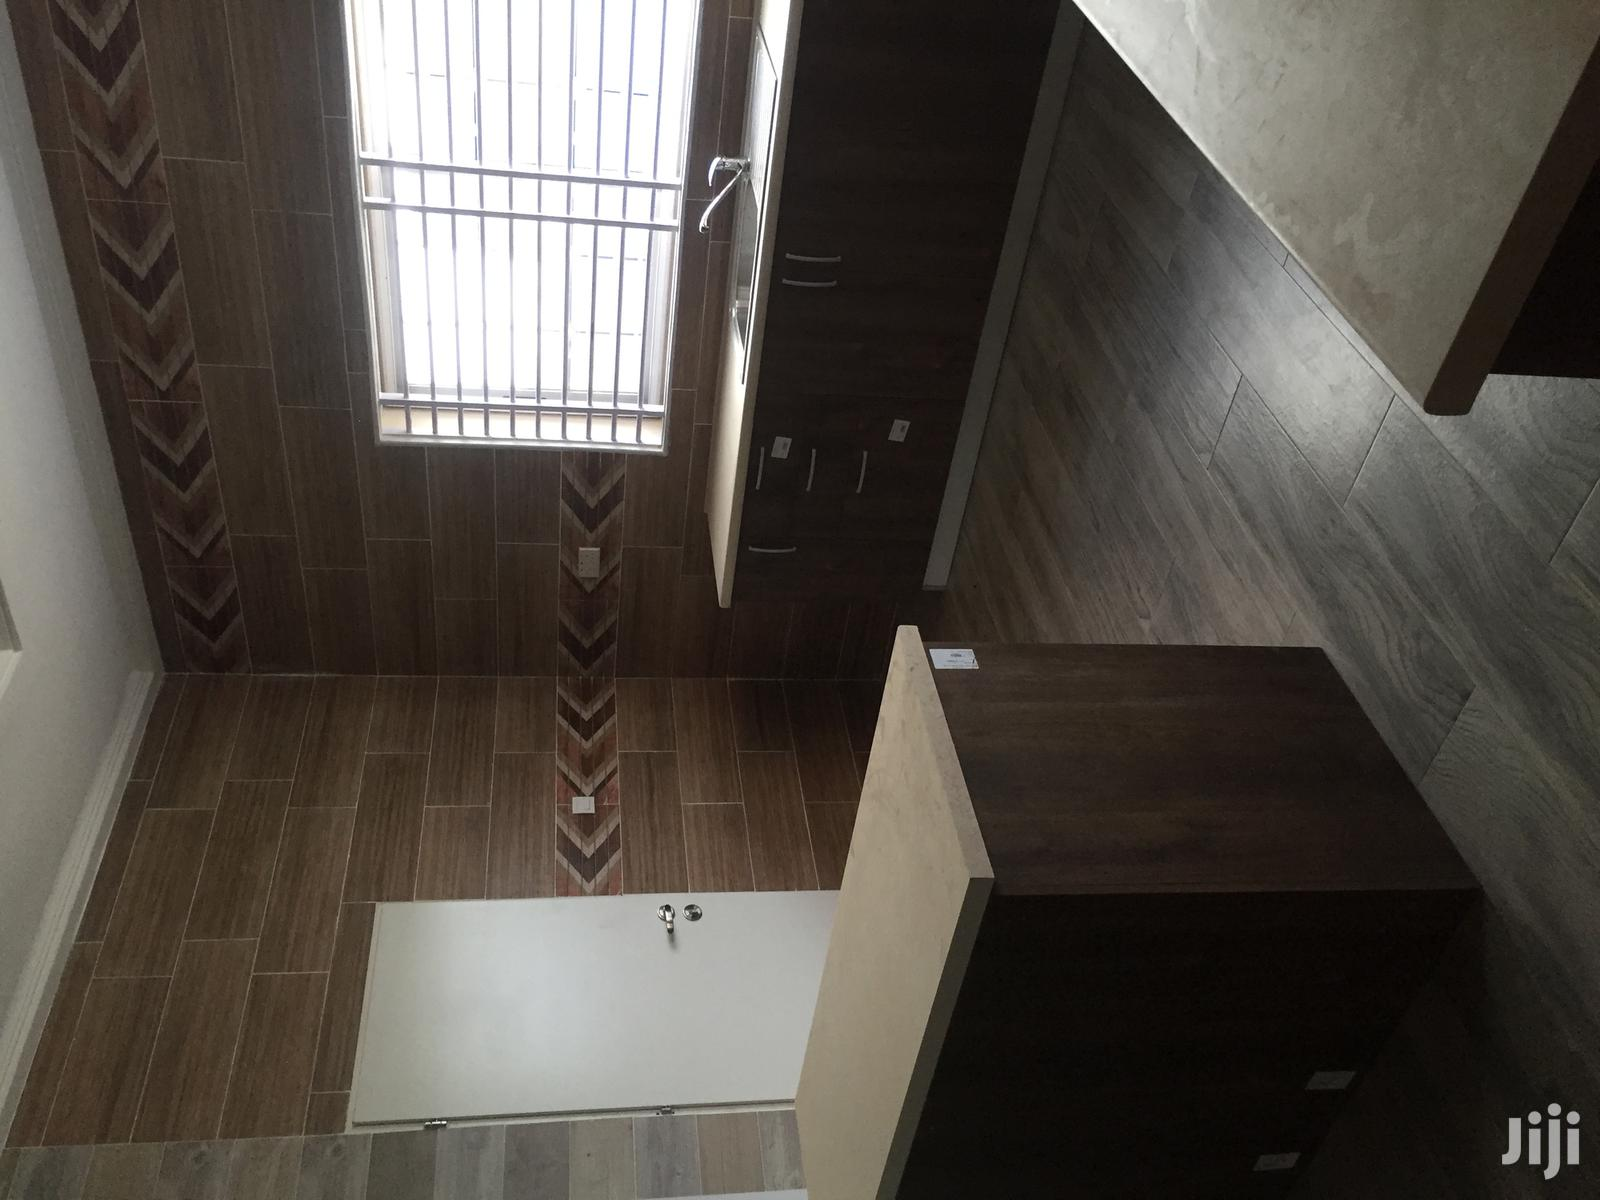 Archive: 3 Bedroom House FOR SALE@ East Legon Hills